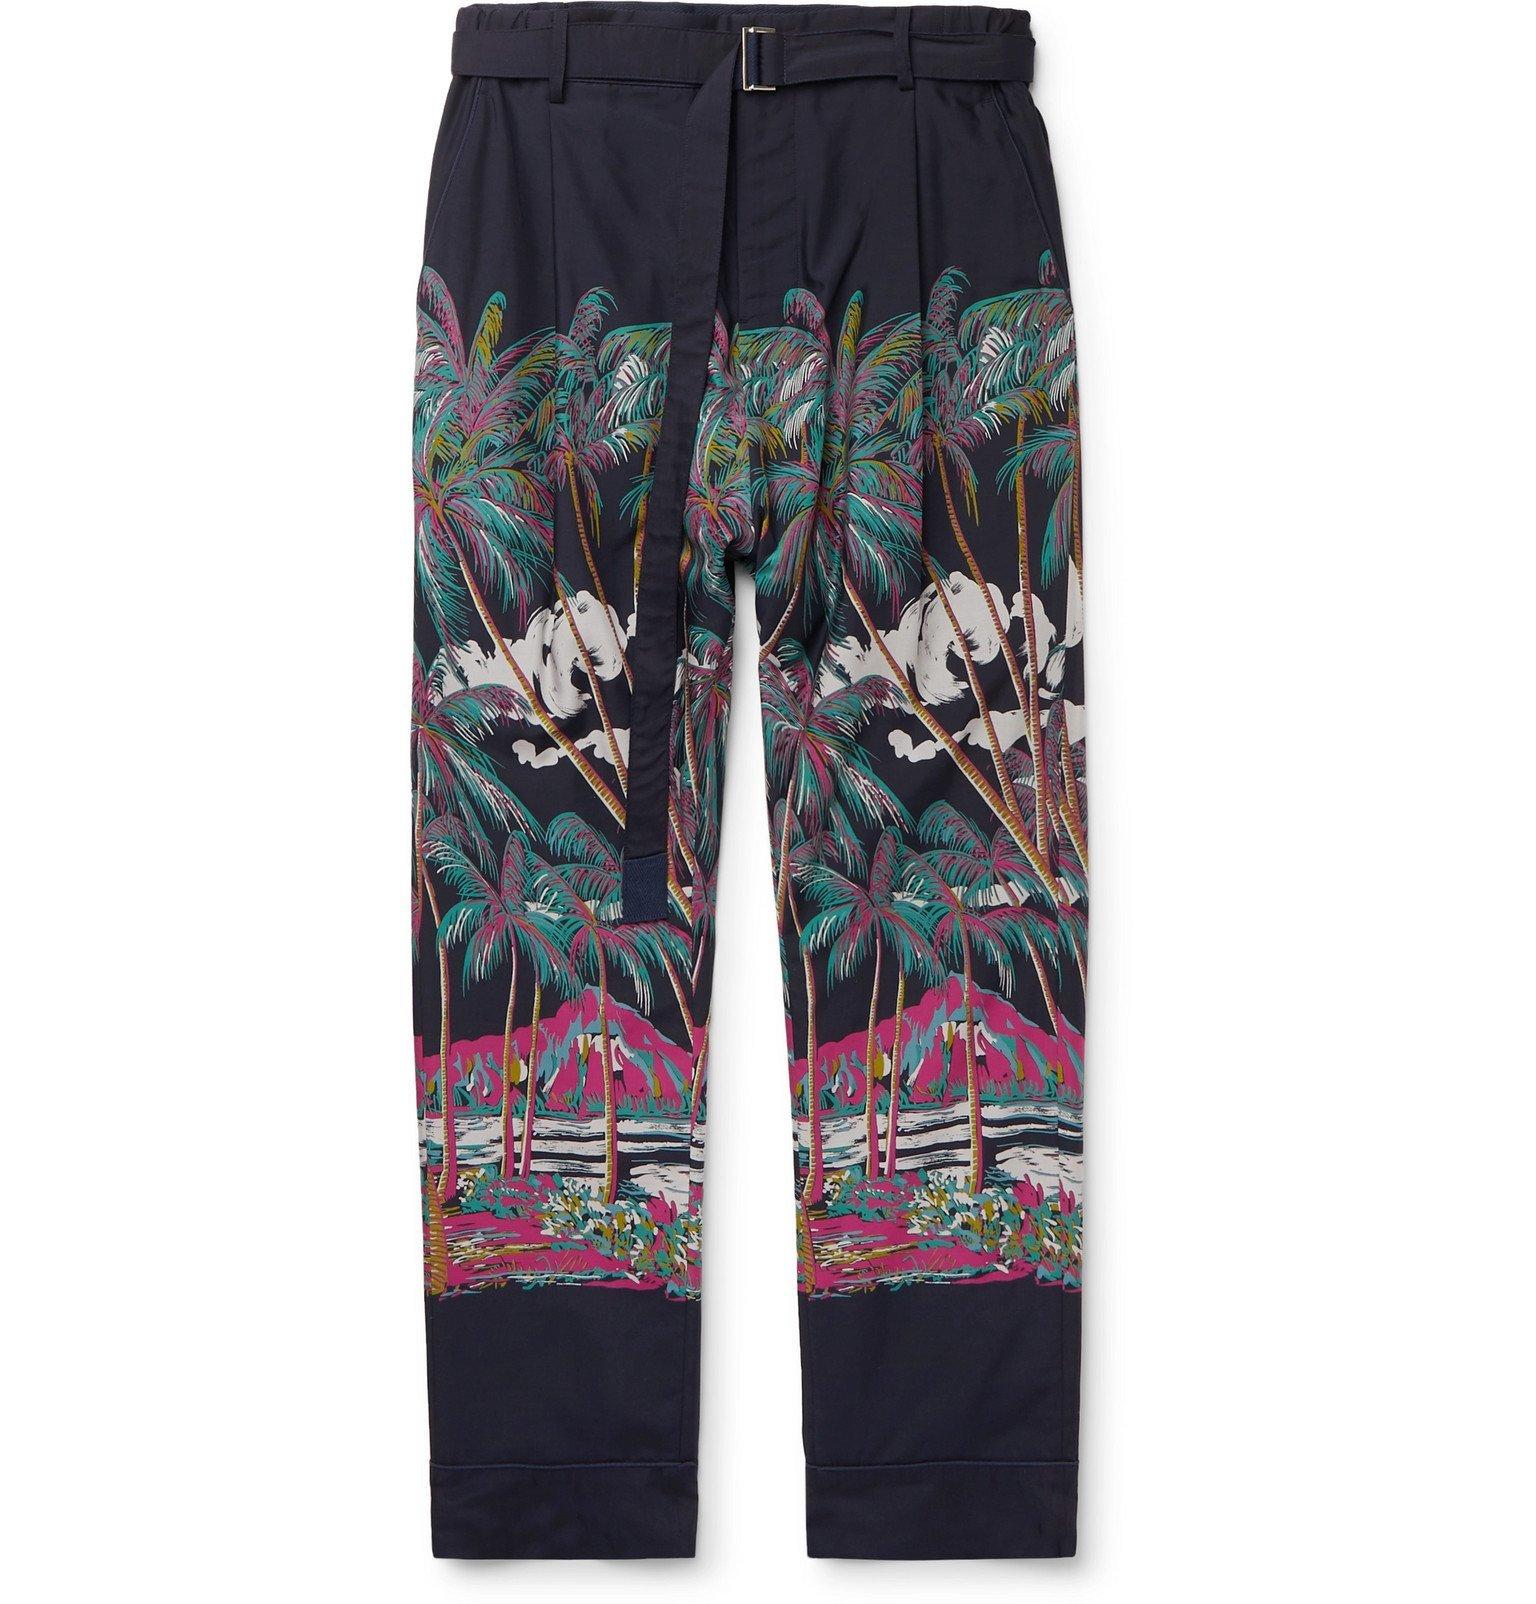 Sacai - SUN SURF Diamond Head Printed Voile Trousers - Multi